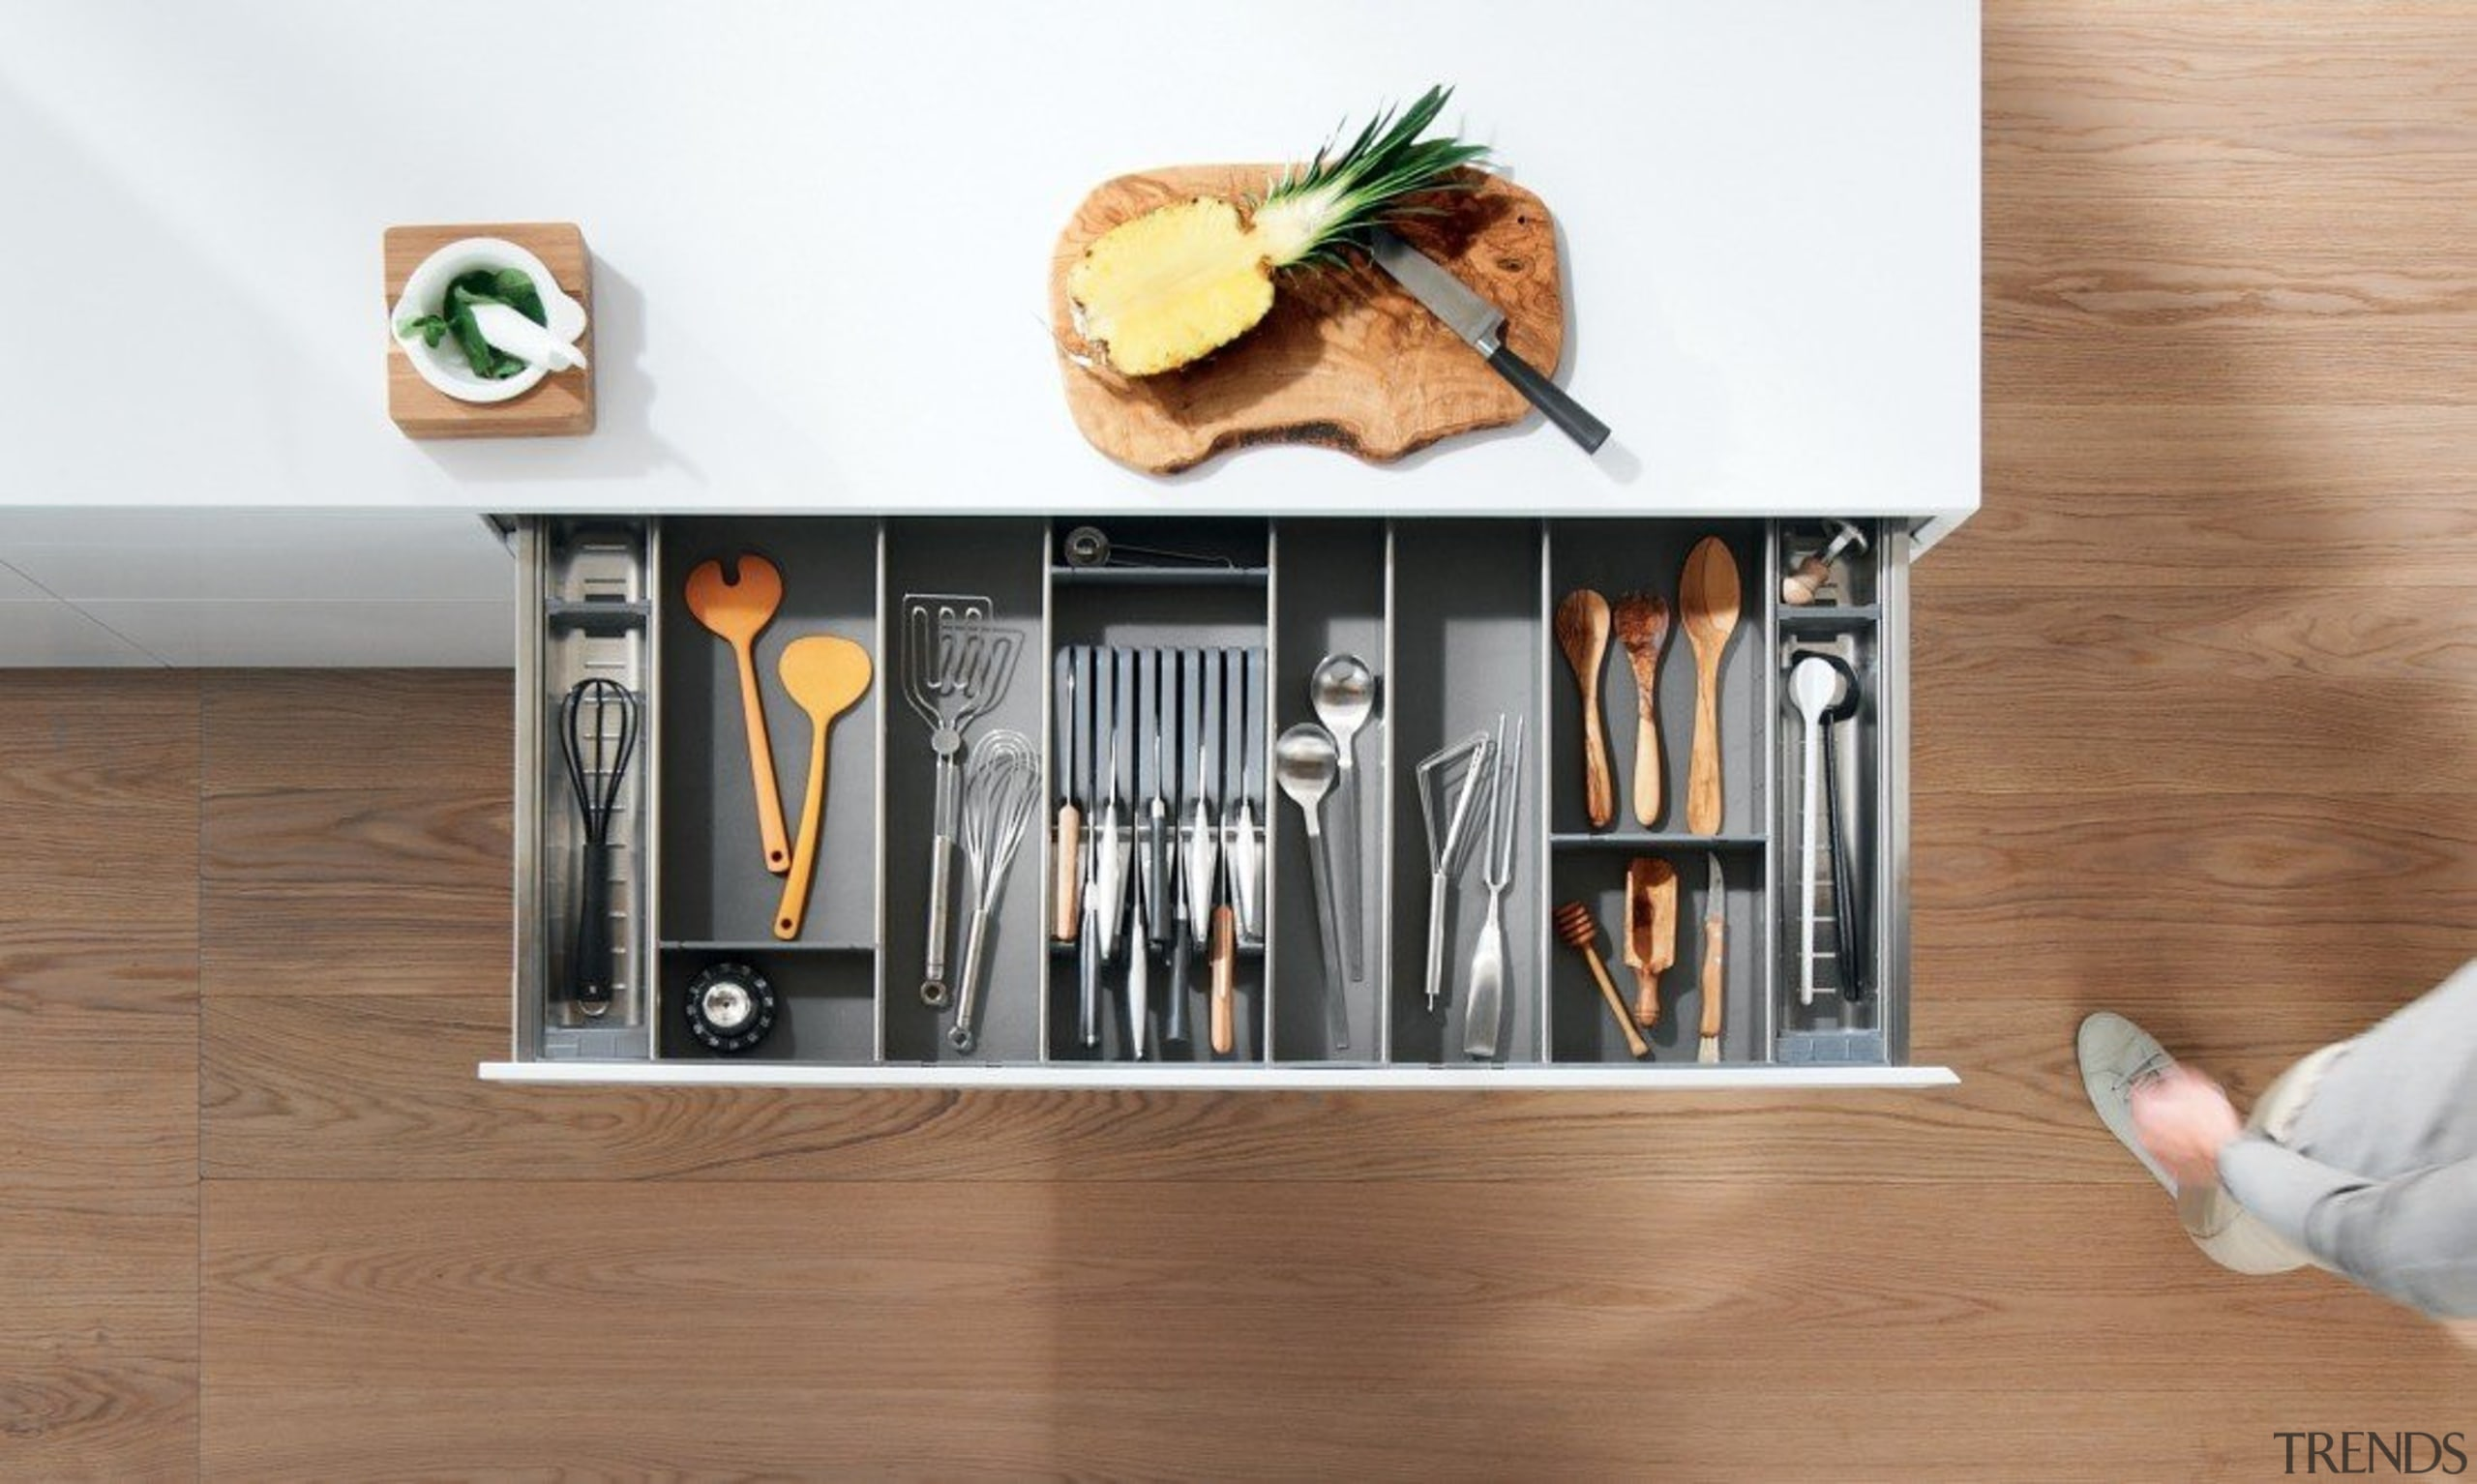 ORGA-LINE inner dividing system – so many practical floor, furniture, product, product design, shelf, shelving, table, brown, white